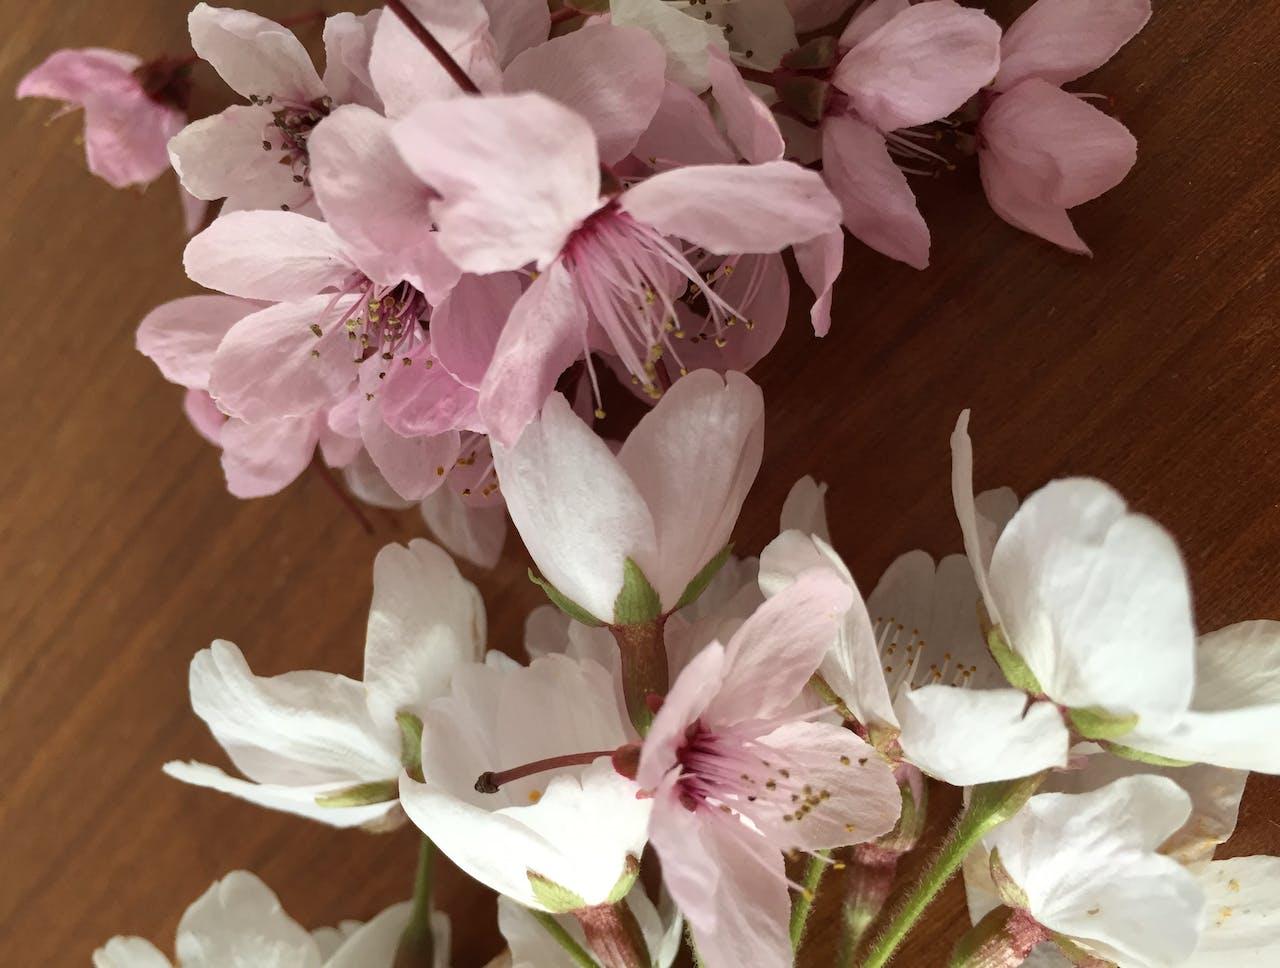 Moduloris machen: Karte mit getrockneten Blüten